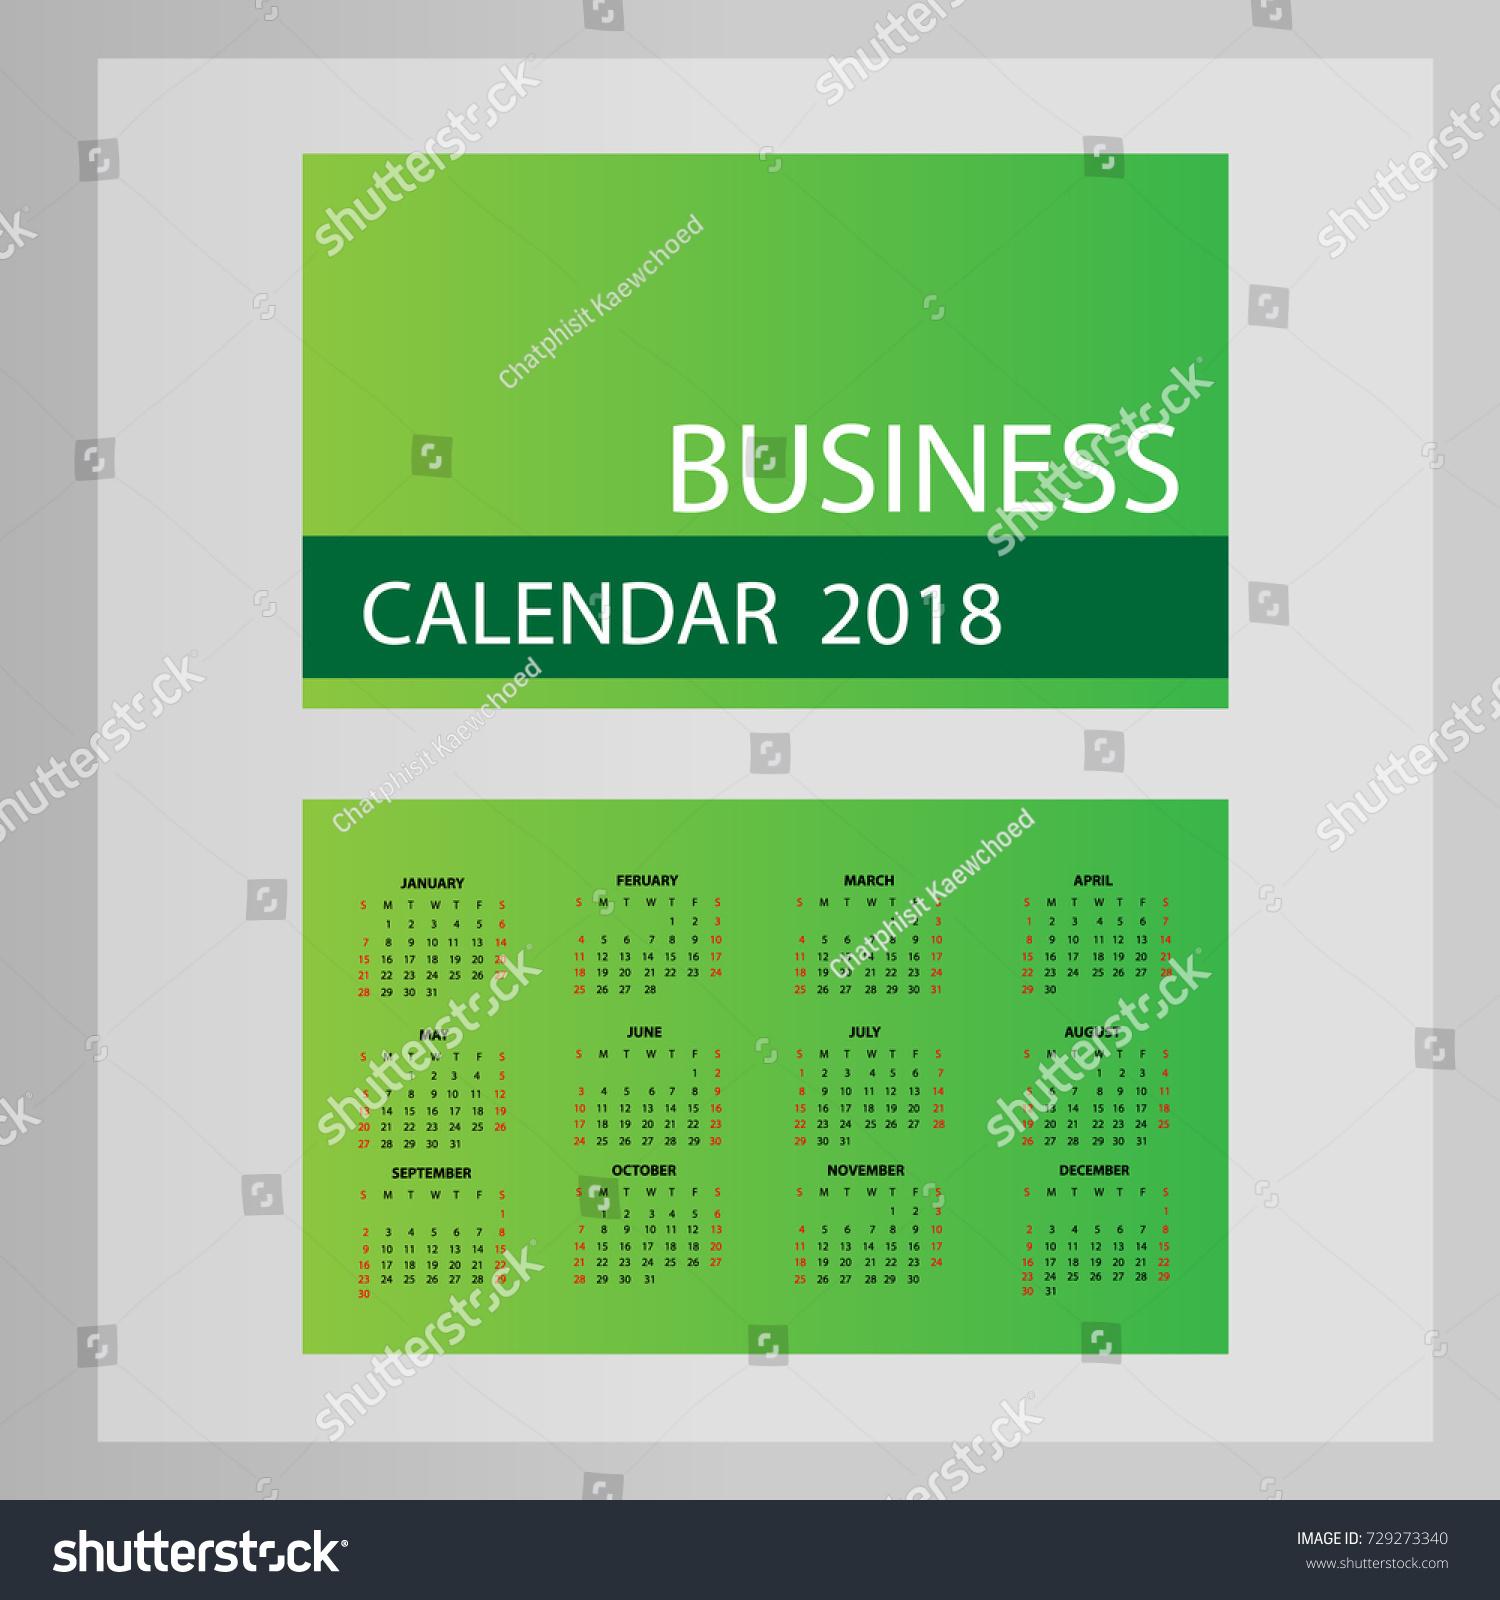 Pretty Business Card Calendar Ideas - Business Card Ideas - etadam ...